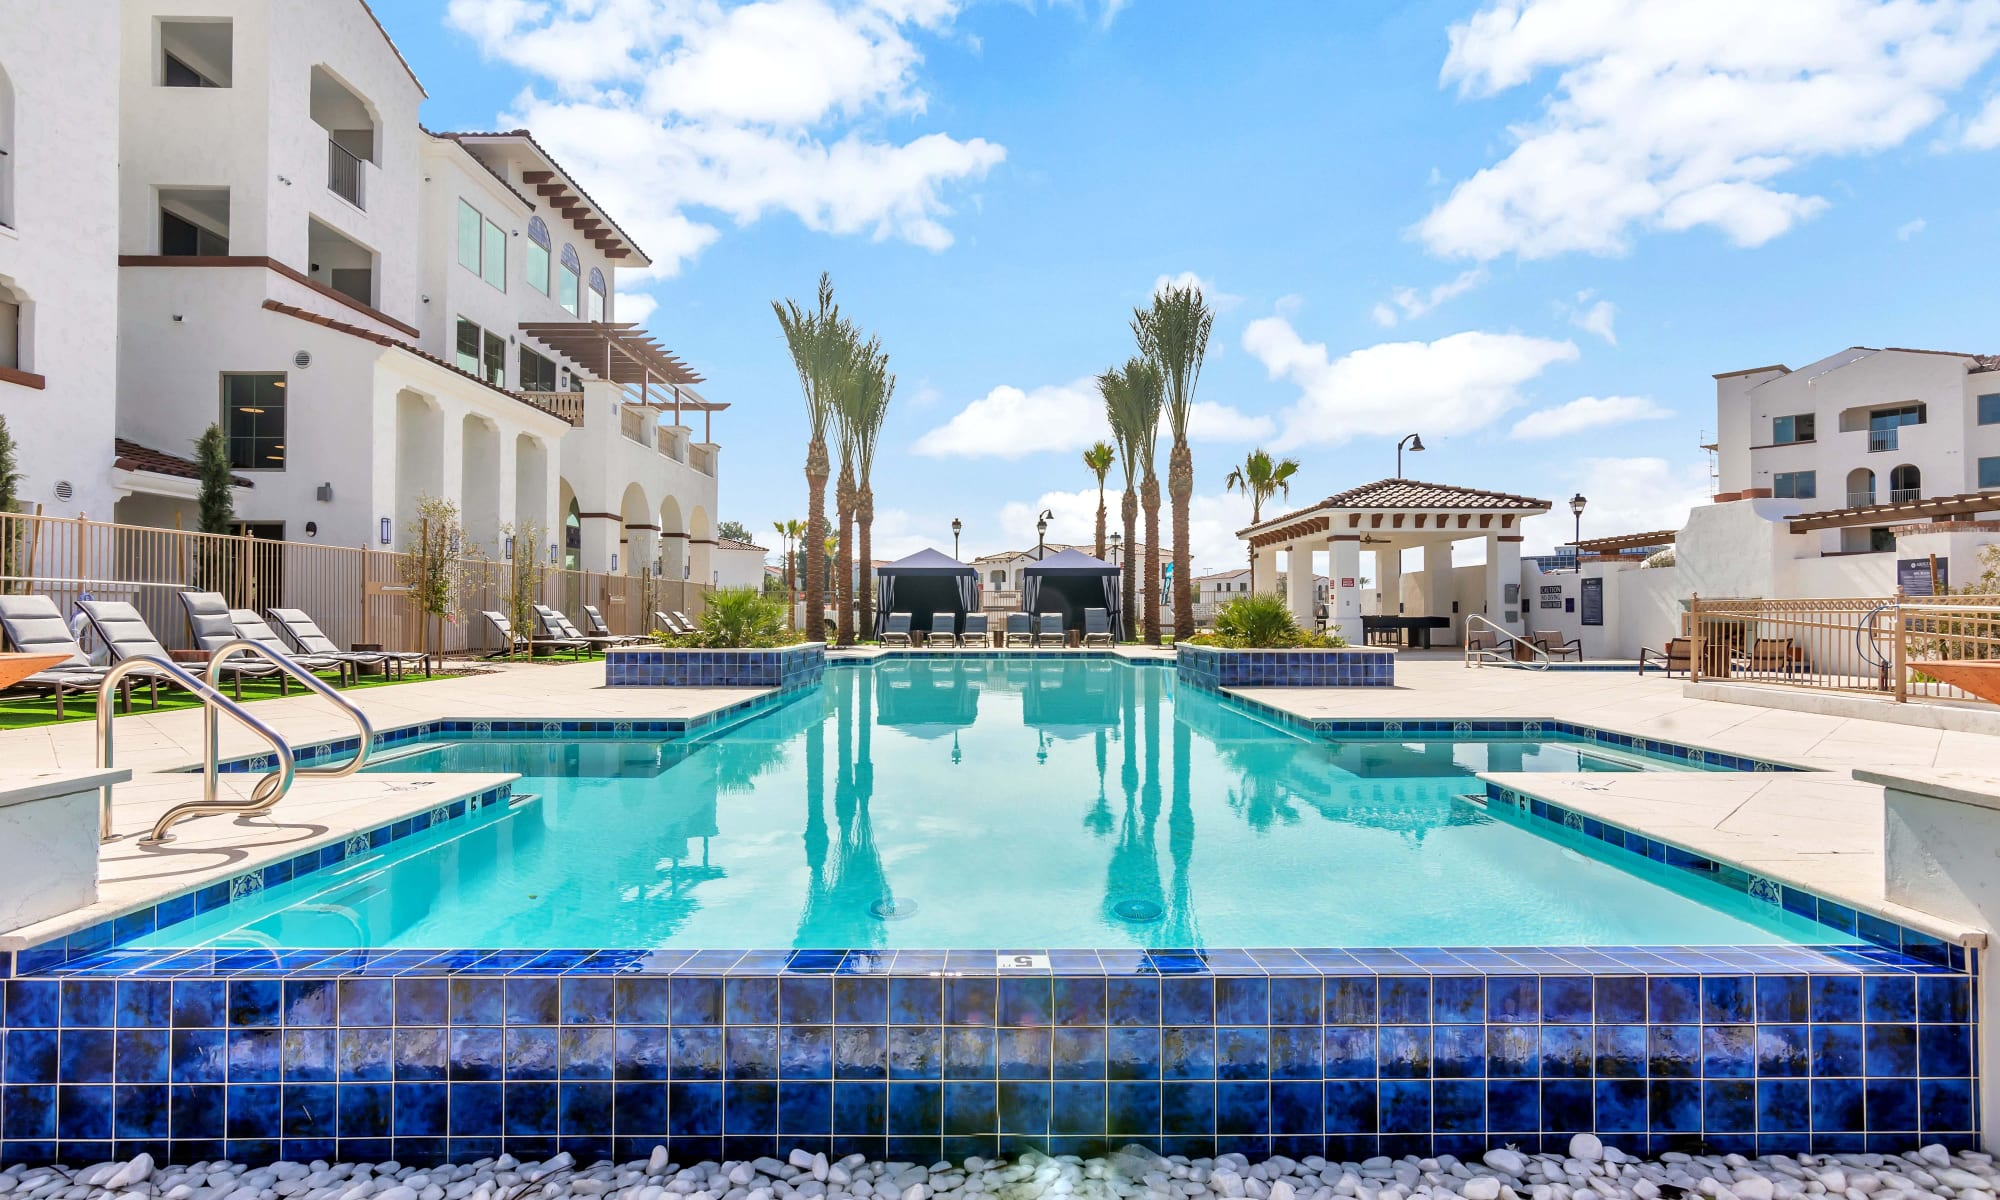 Resort style pool at Arista at Ocotillo in Chandler, Arizona